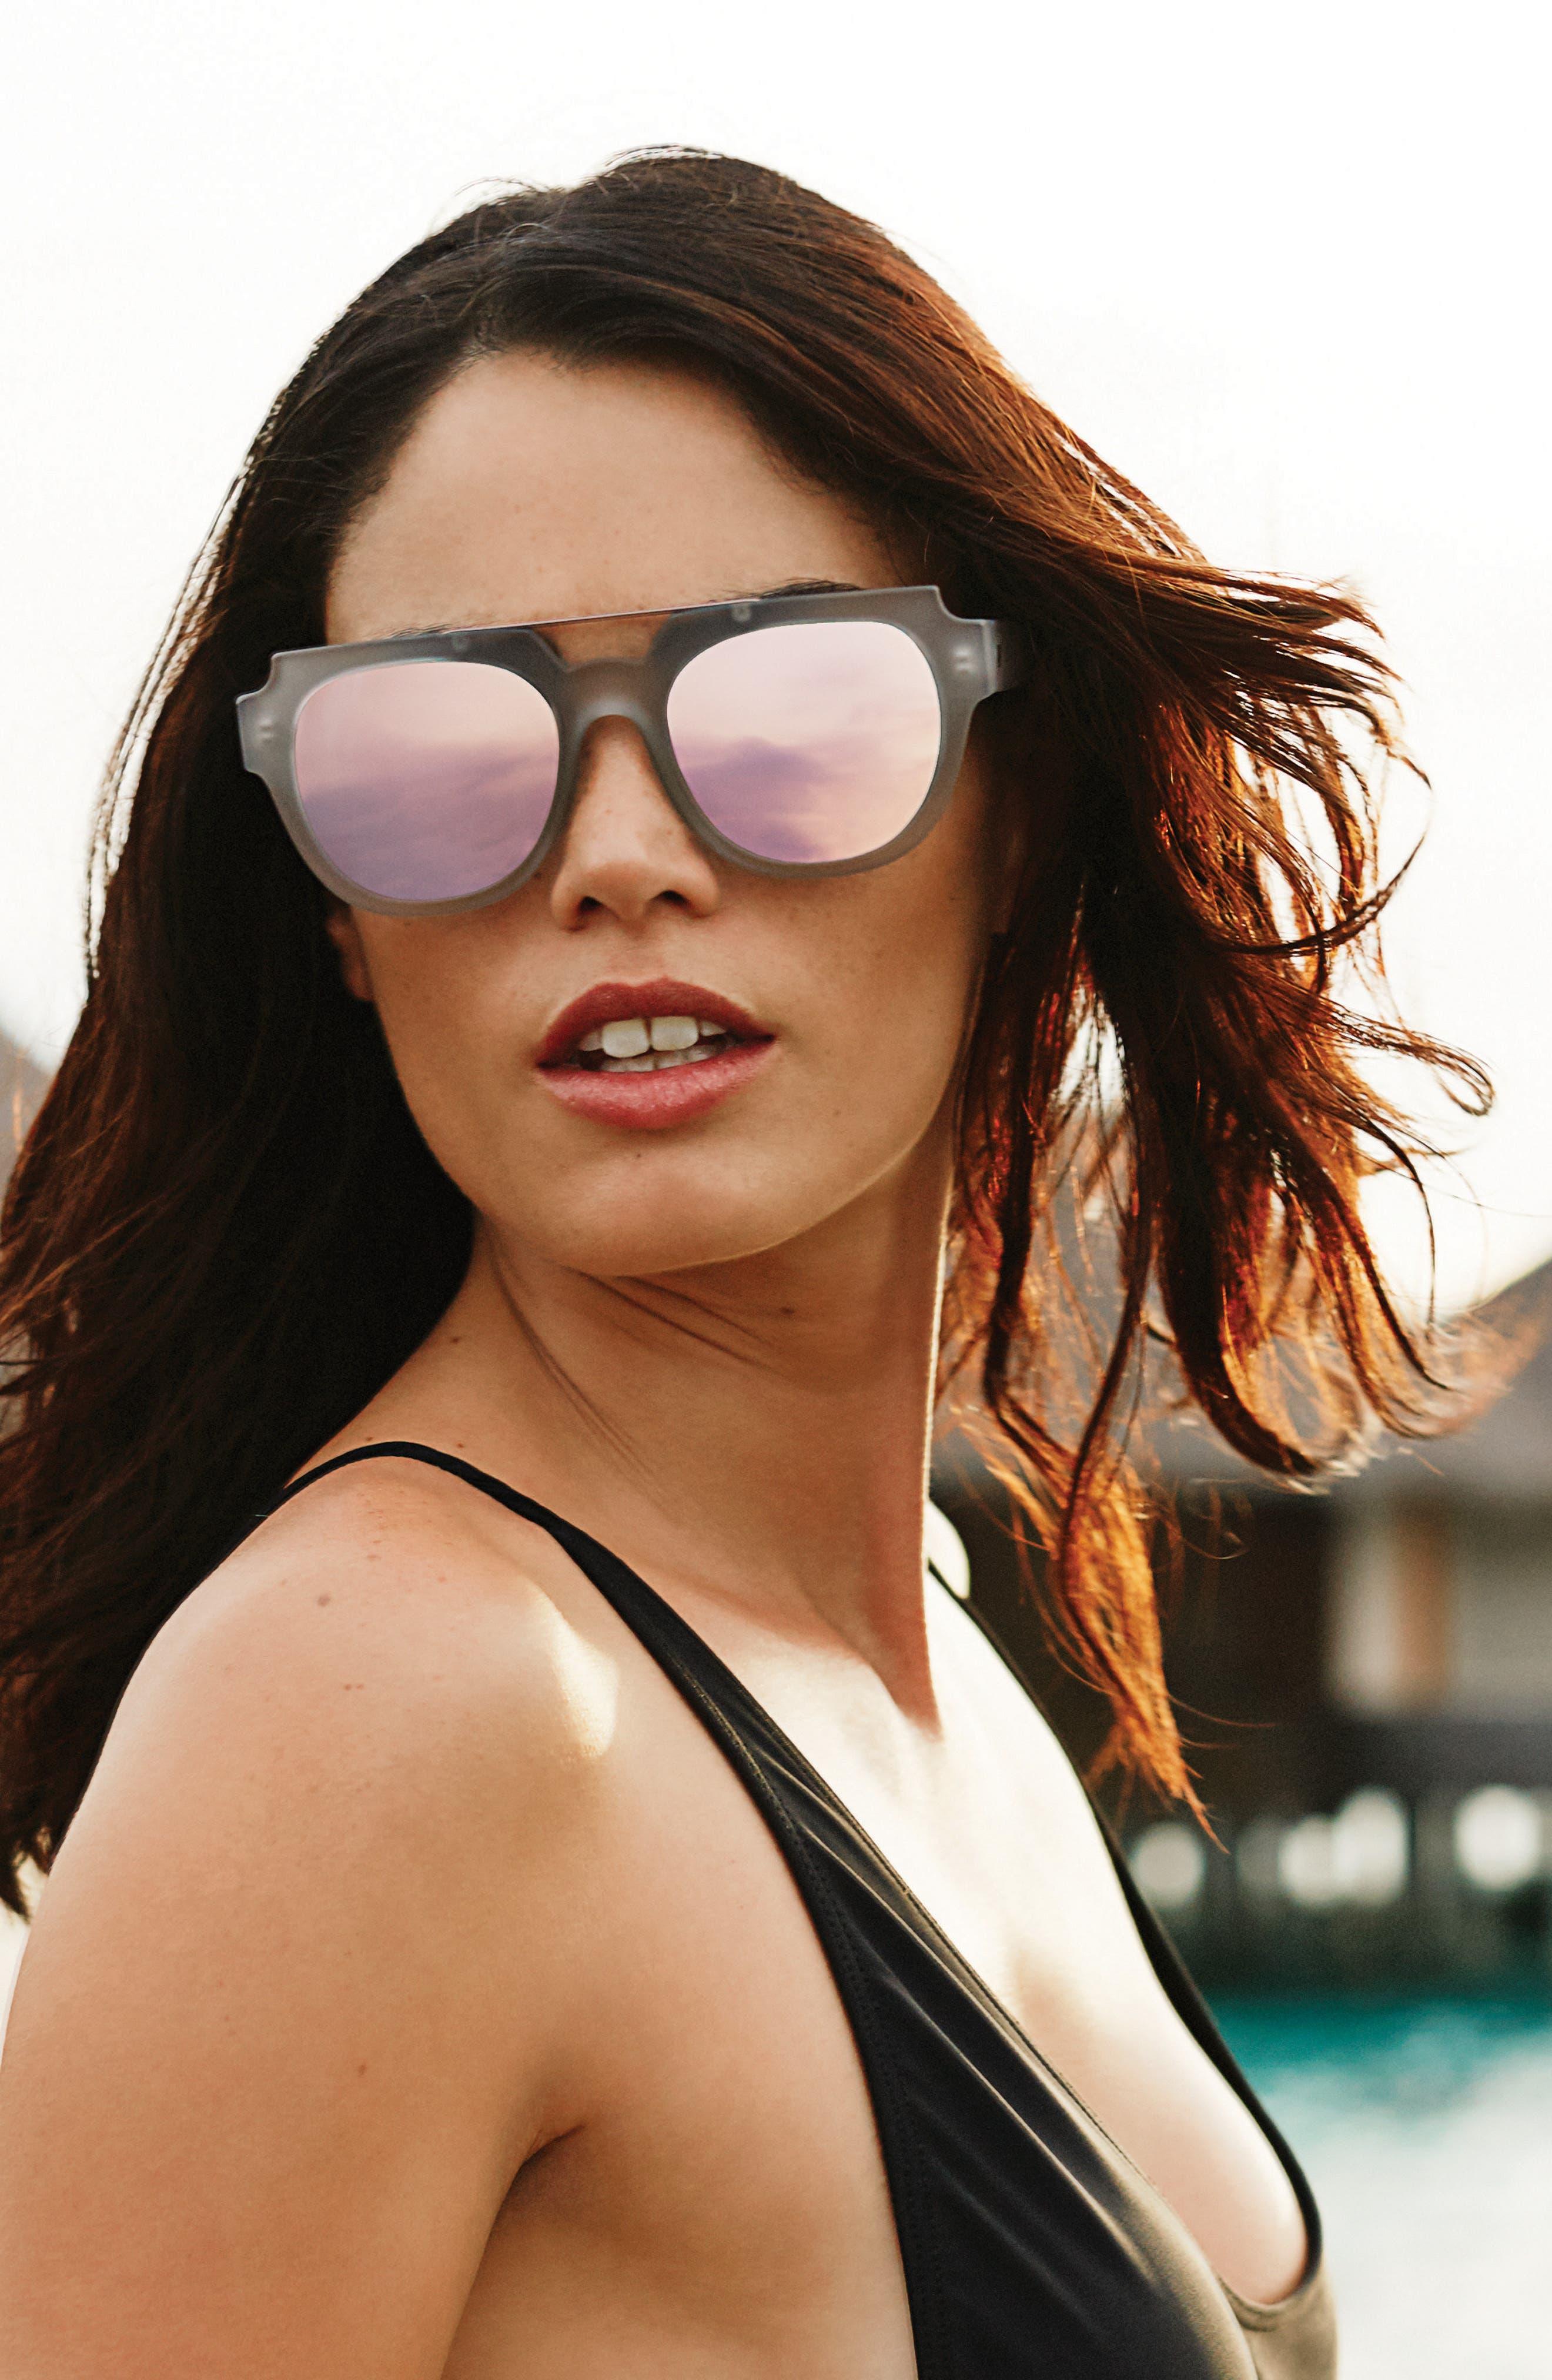 La Habana 52mm Retro Sunglasses,                             Alternate thumbnail 3, color,                             Matte Mist